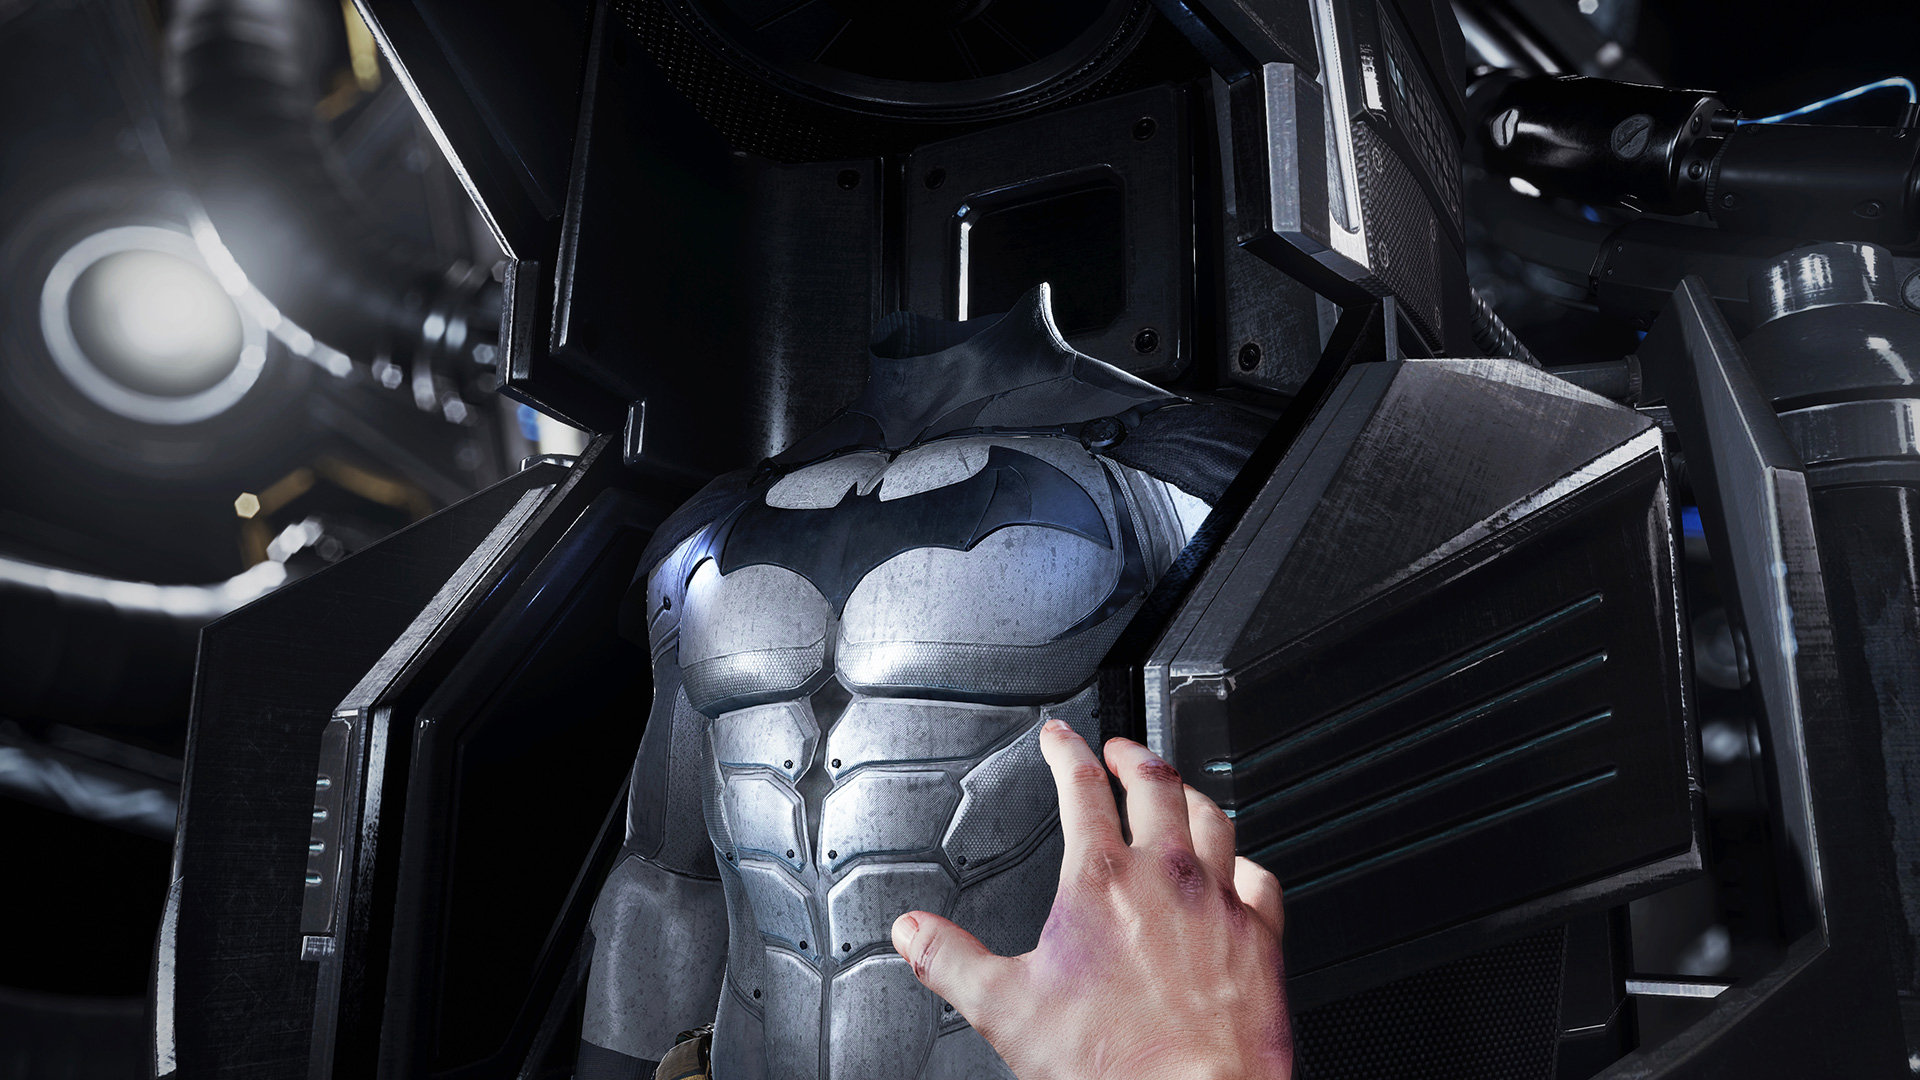 batman-arkham-vr-screen-01-ps4-eu-15jul16.jpg